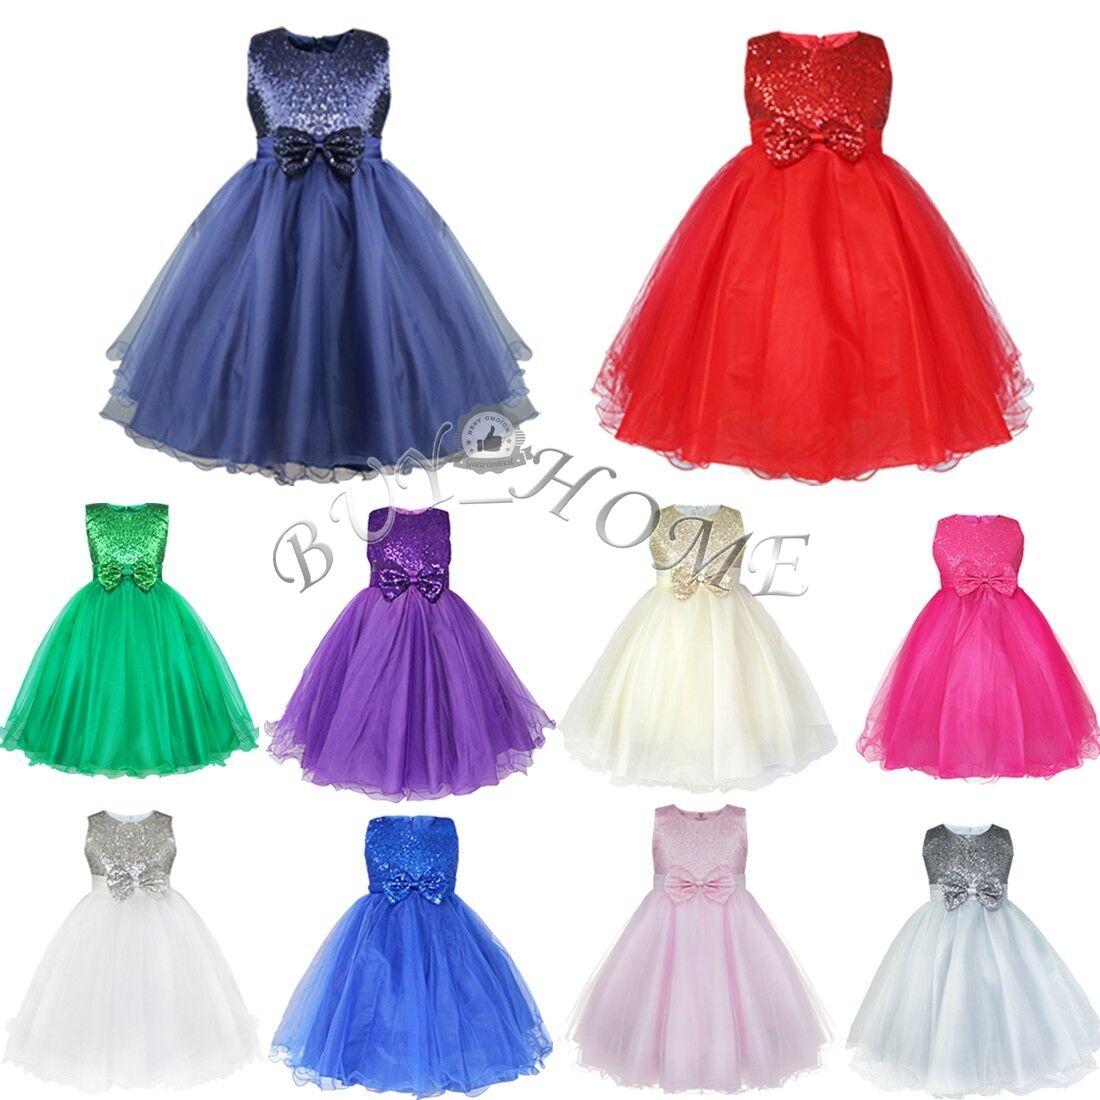 Flower Girl Dress Kids Sequins Tutu Princess Party Pageant Bridesmaid Lace Gown